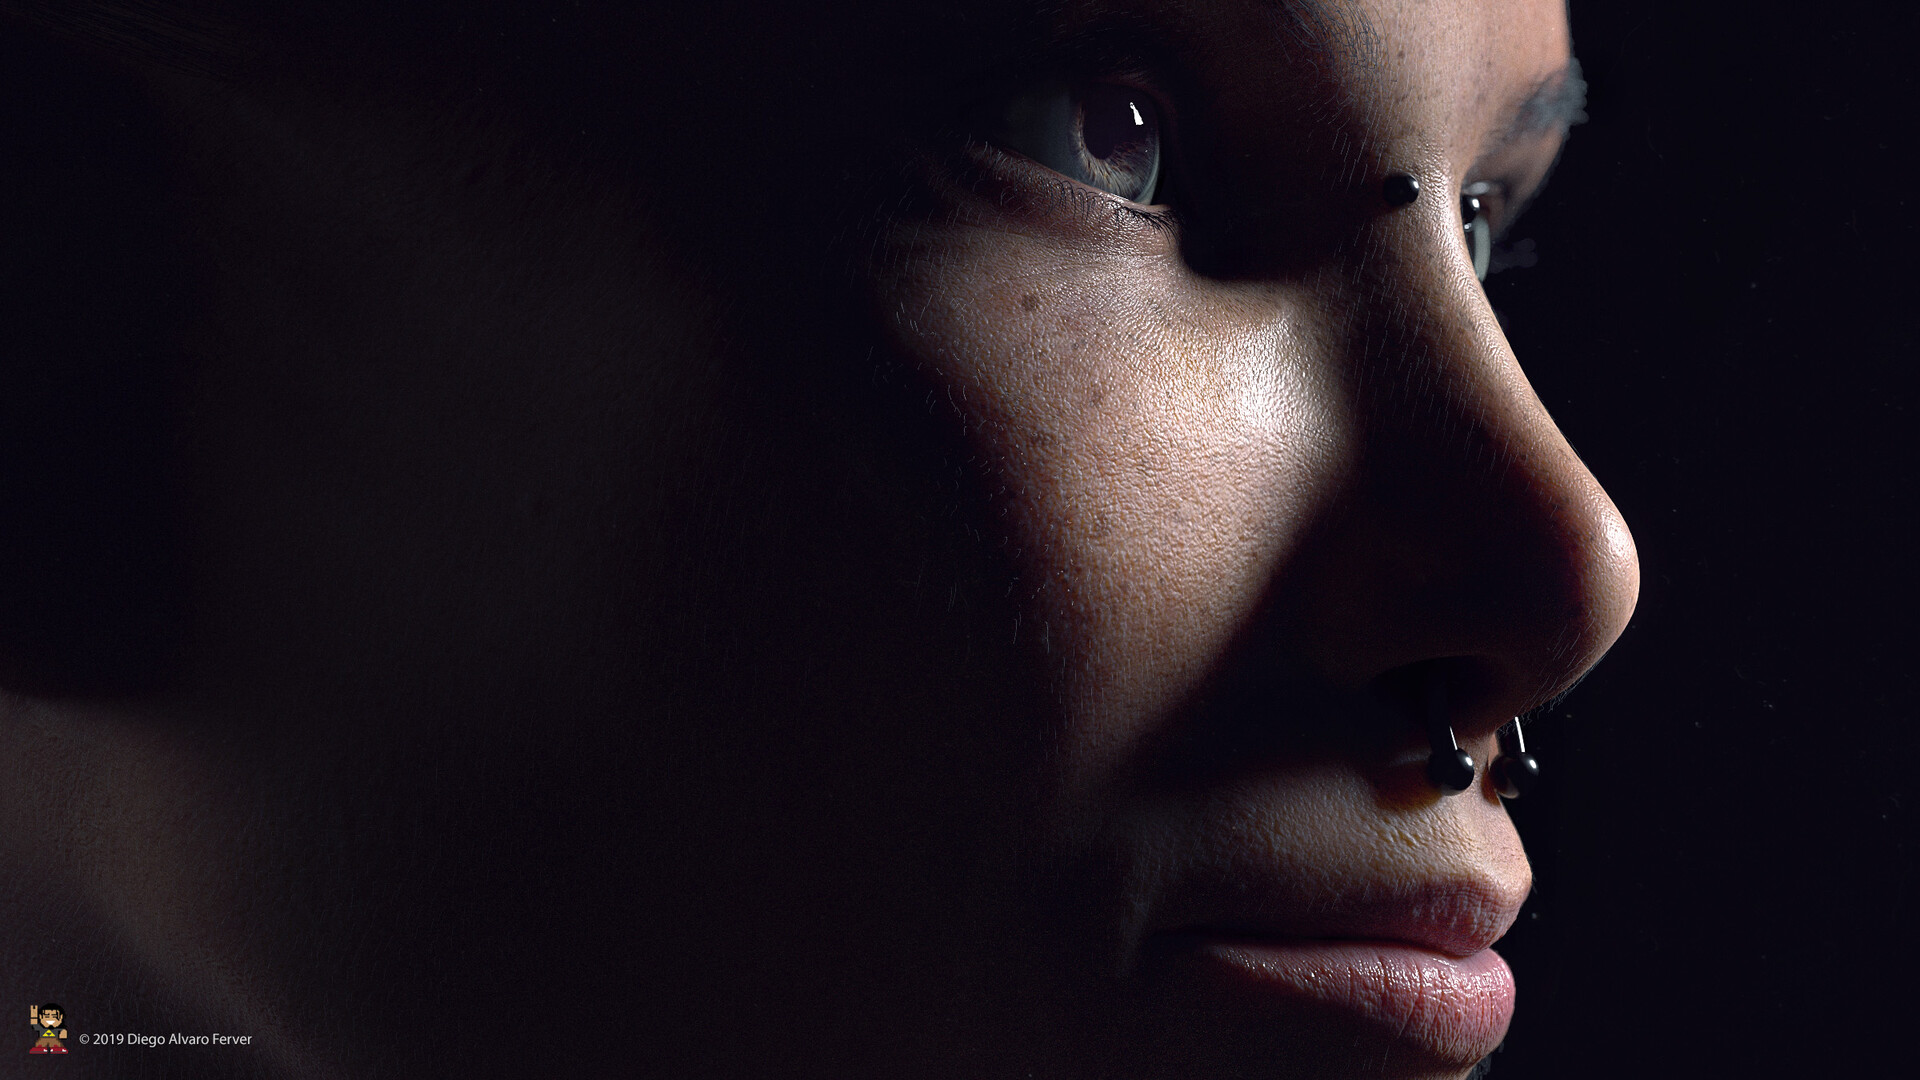 [Image: diego-alvaro-ferver-portrait-of-mia-001-updated.jpg]